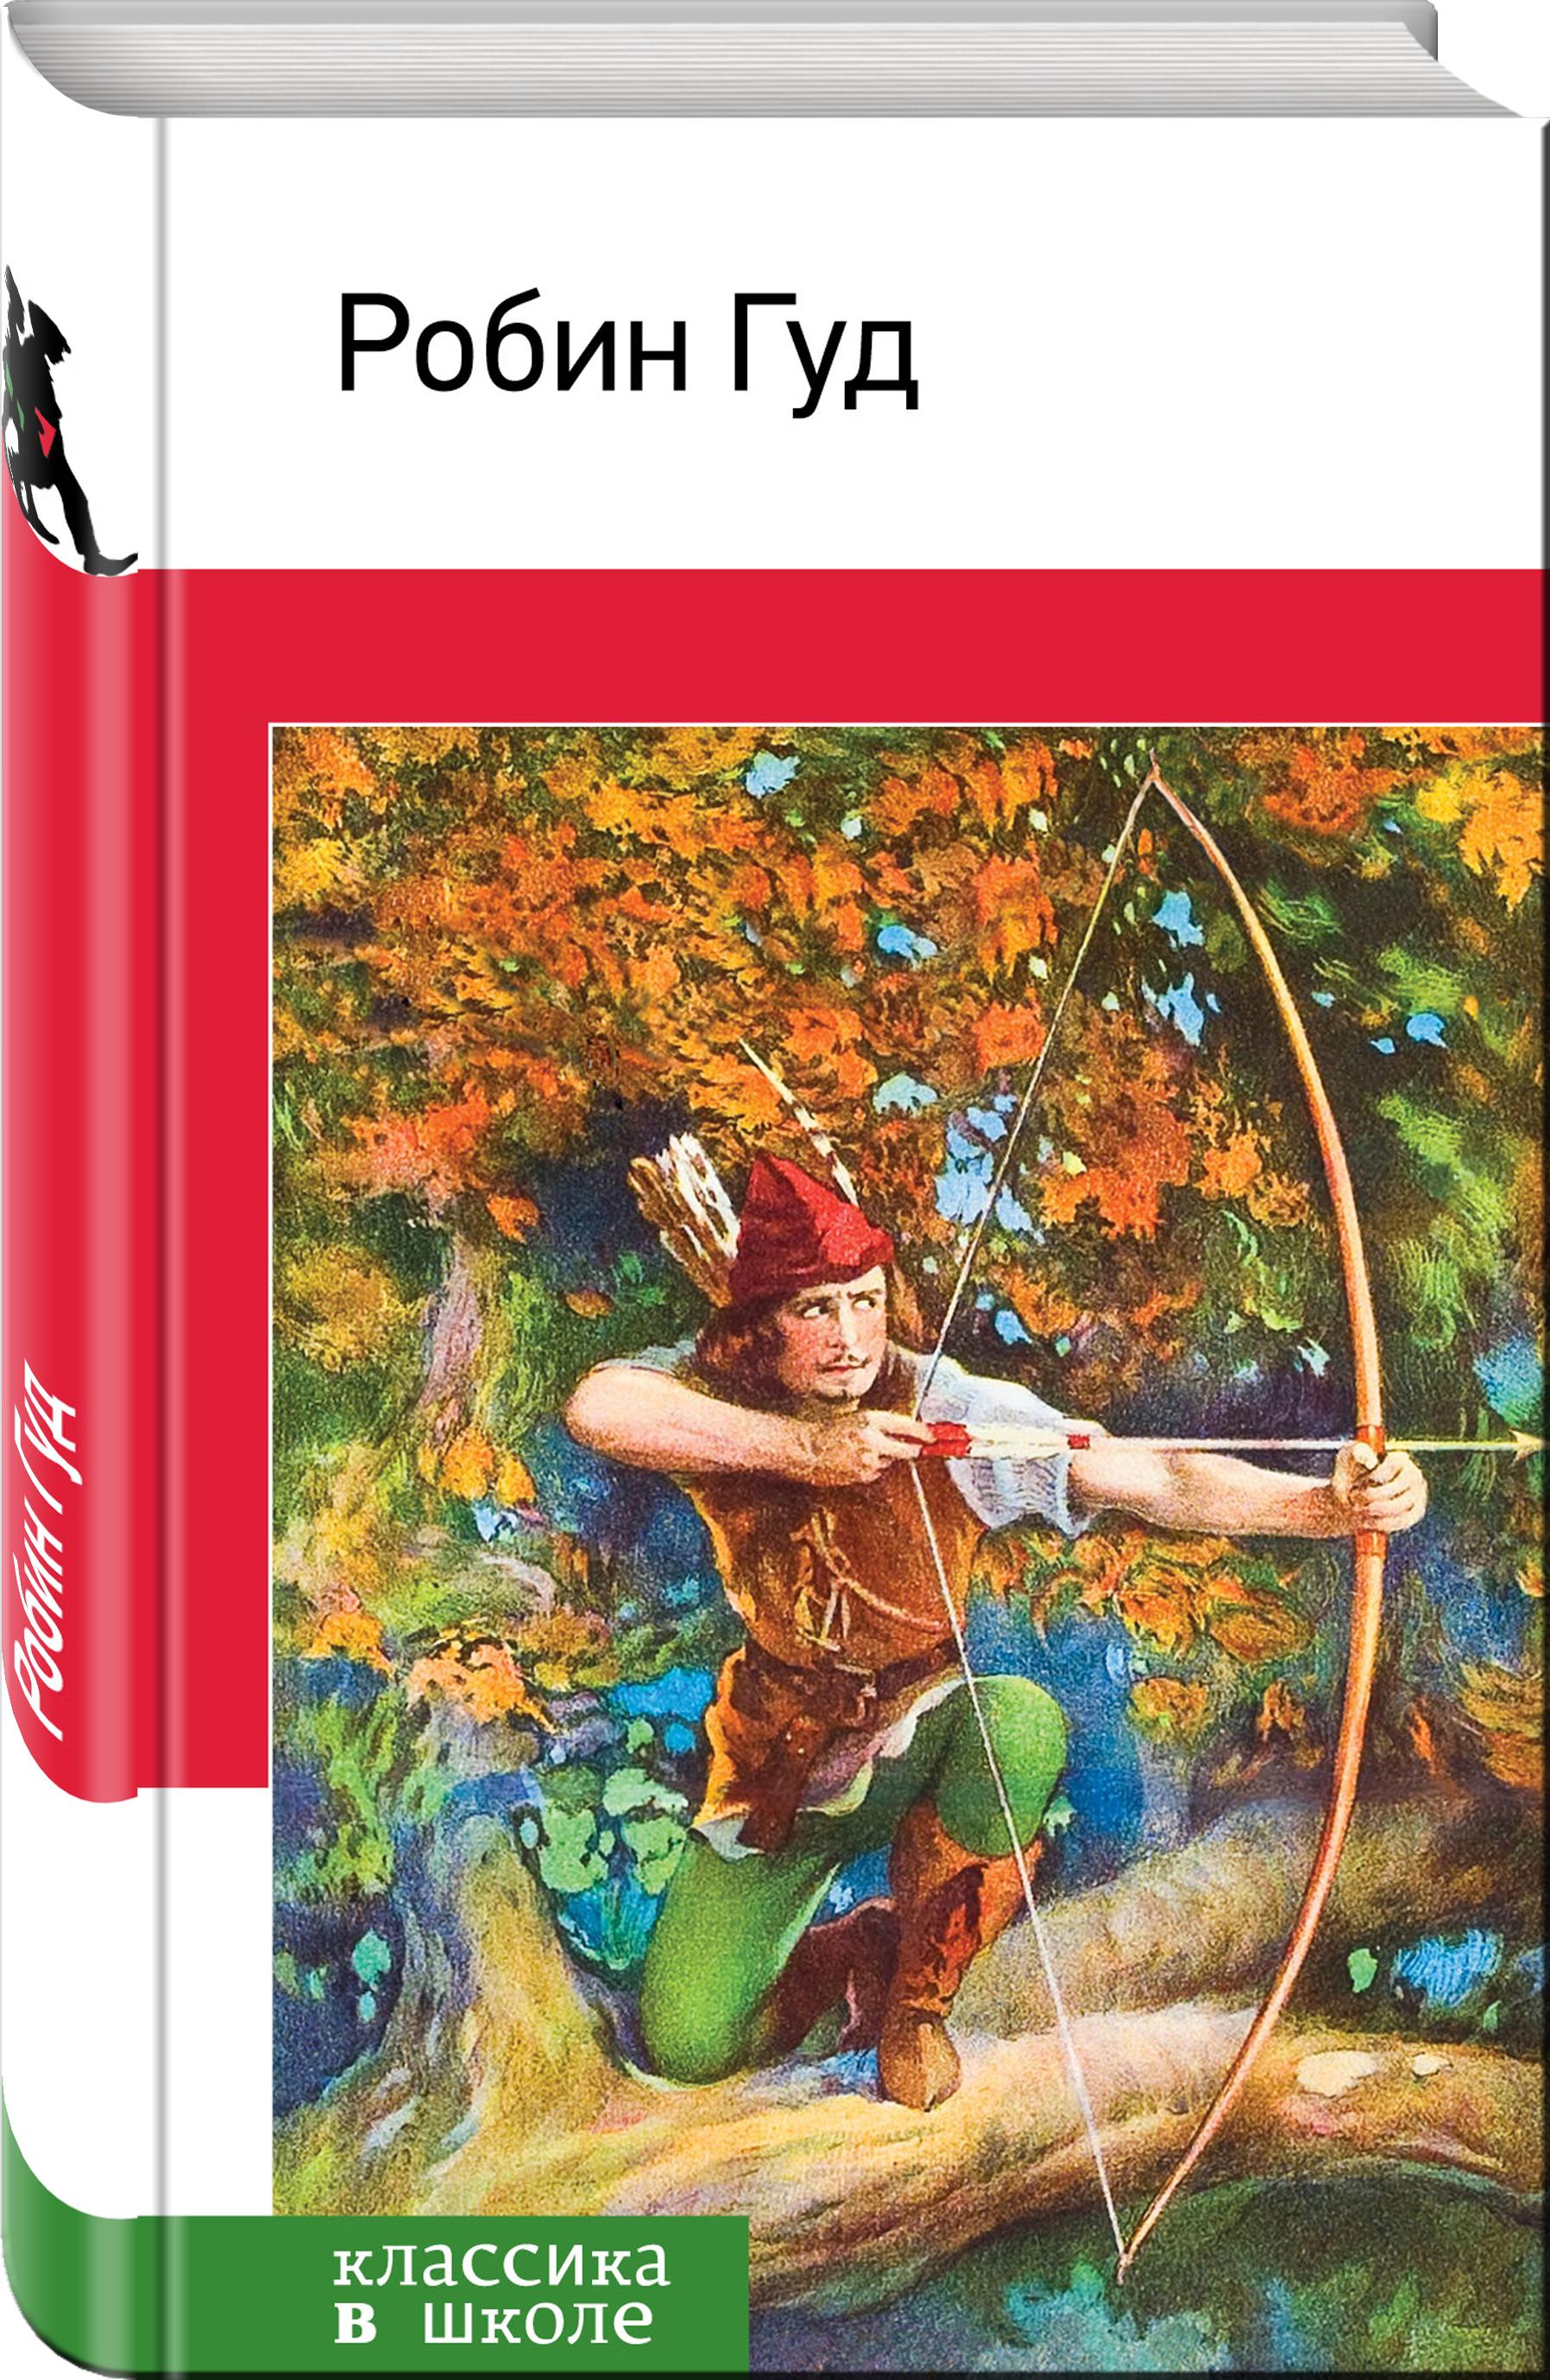 Гершензон М.А. Робин Гуд чесова н адапт legends of robin hood легенды о робин гуде